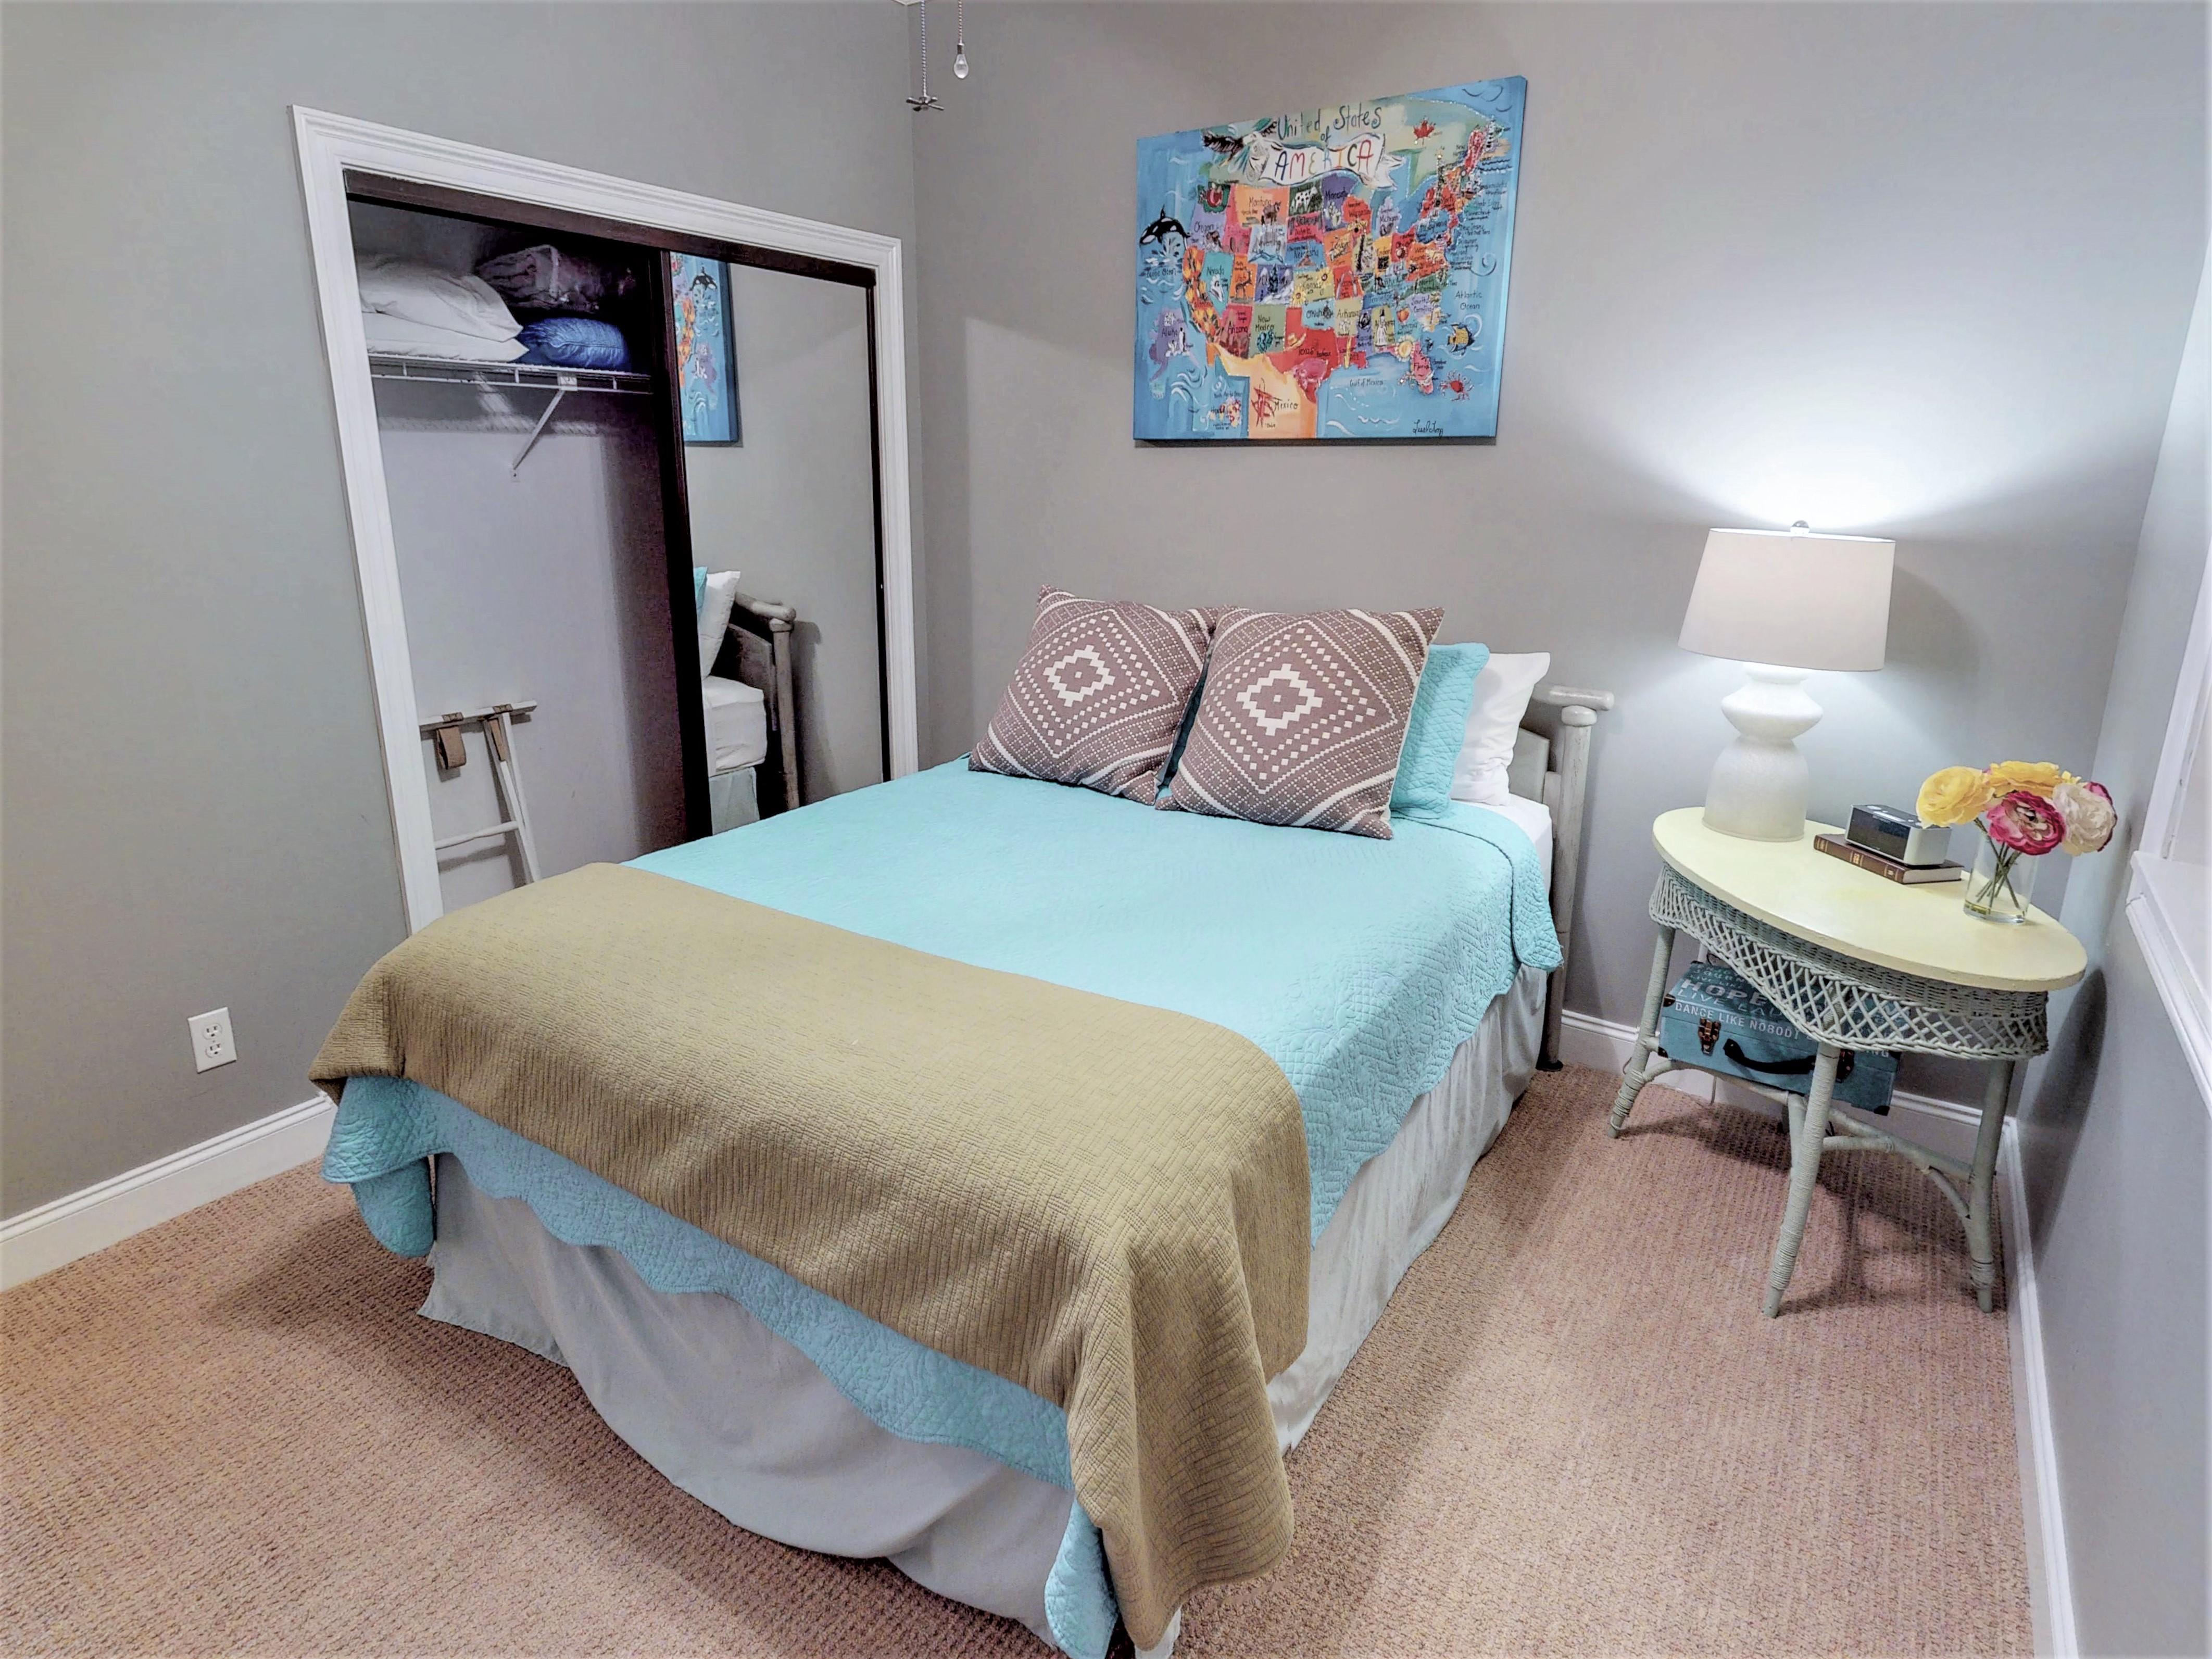 905 Tops'l Beach Manor Condo rental in TOPS'L Beach Manor  in Destin Florida - #15